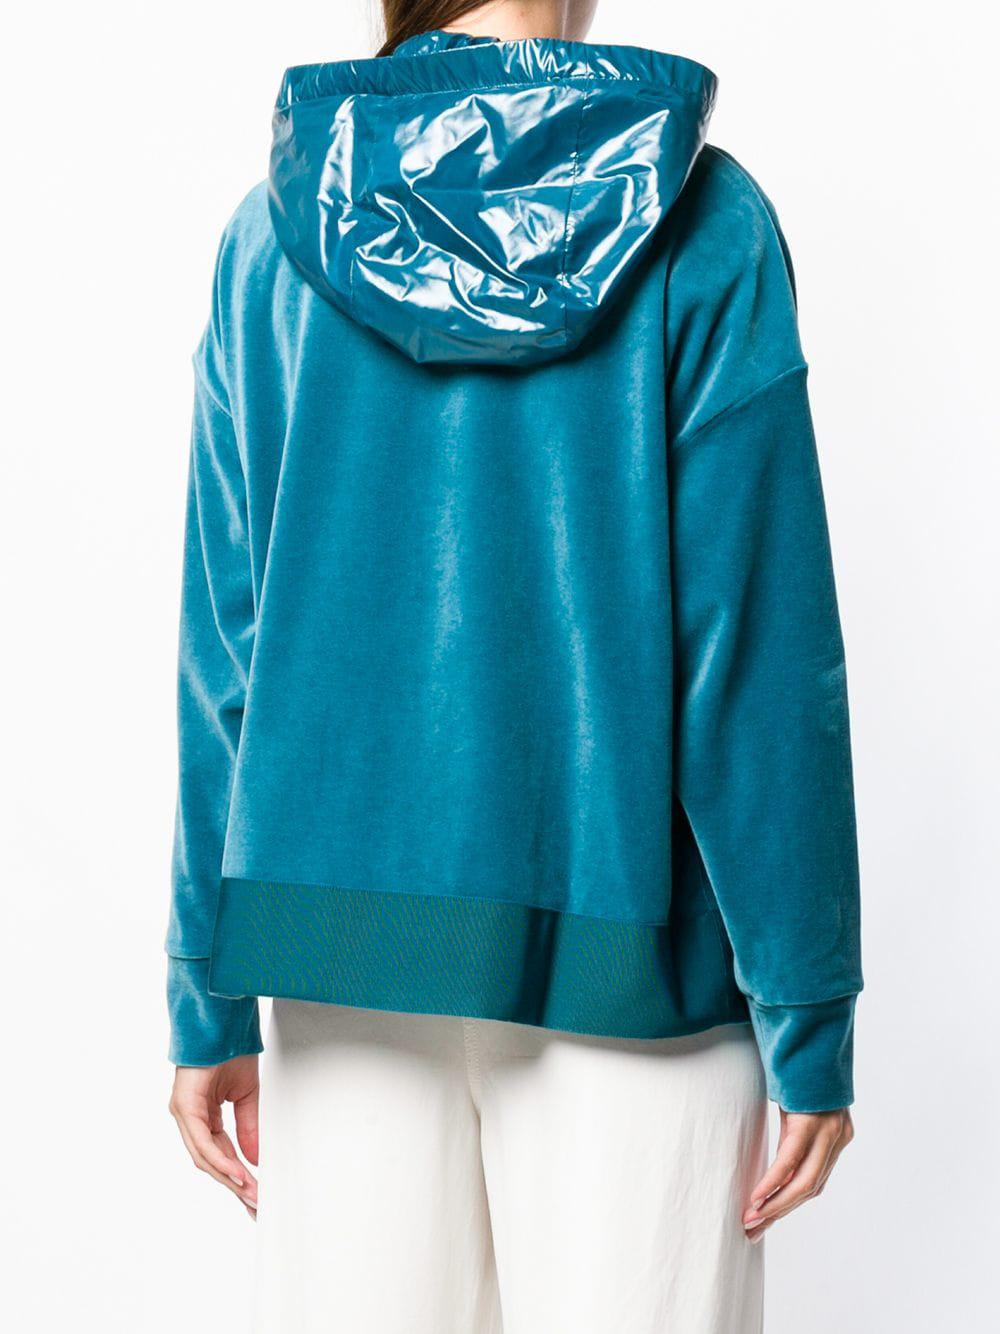 79bfccfcf0c7 Lyst - Moncler Zipped Hooded Sweatshirt in Blue